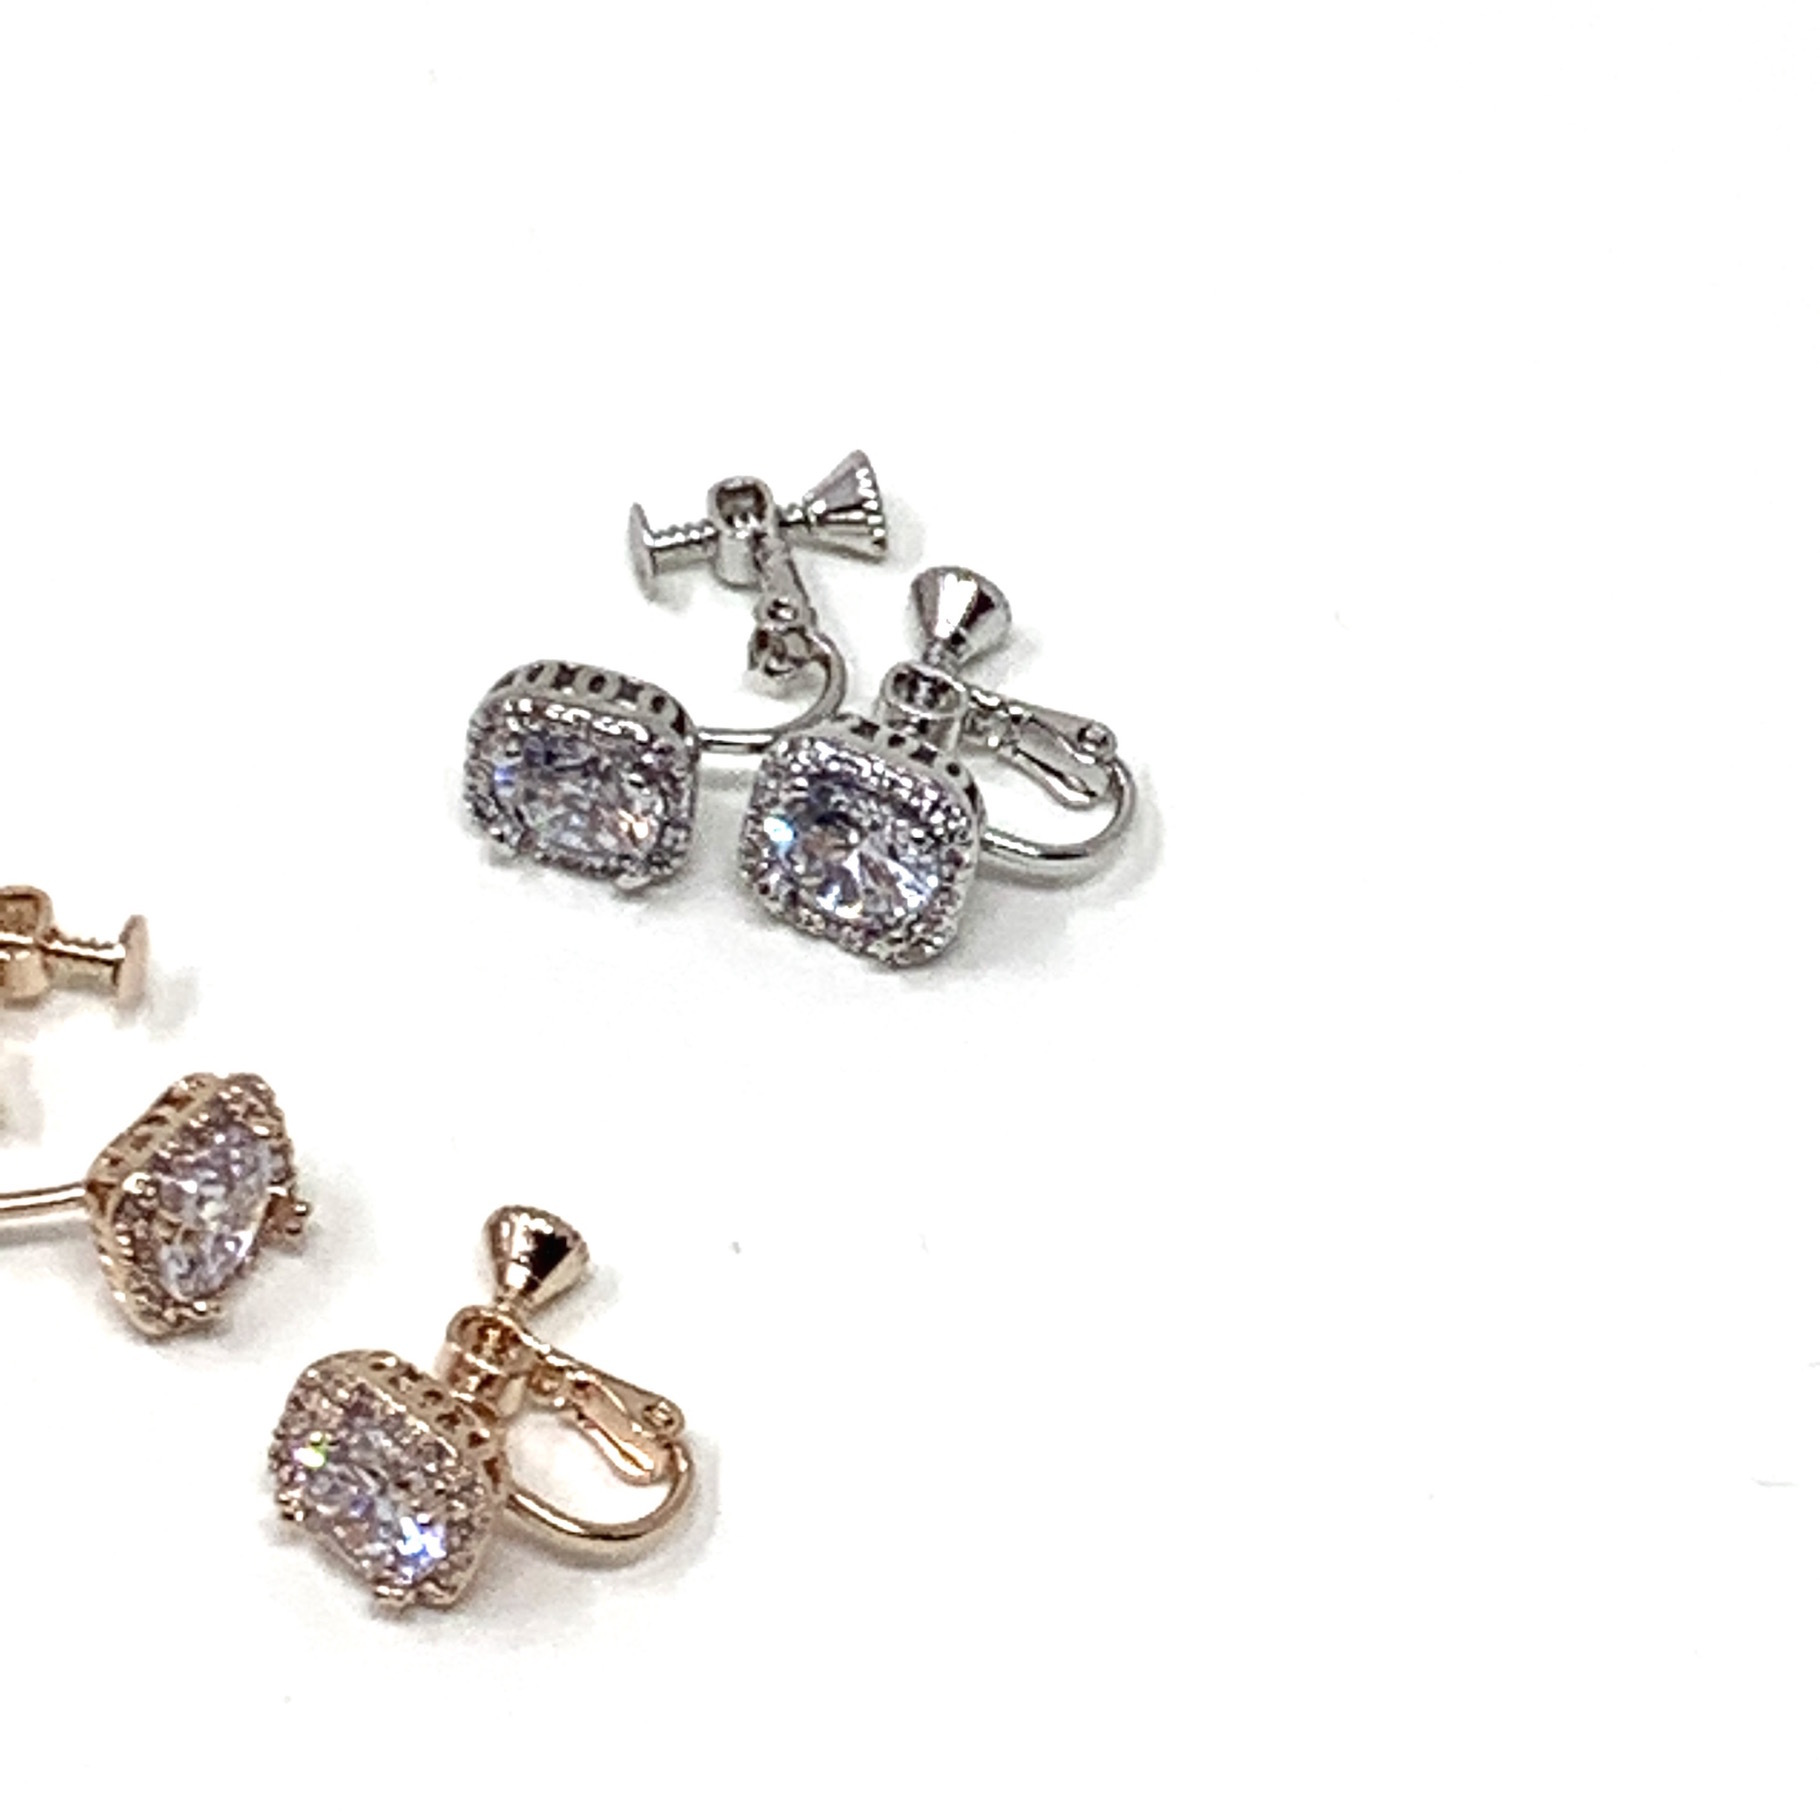 Square drop earrings  |スクエアドロップイヤリング|CZ| #141|【STELLAPARK】